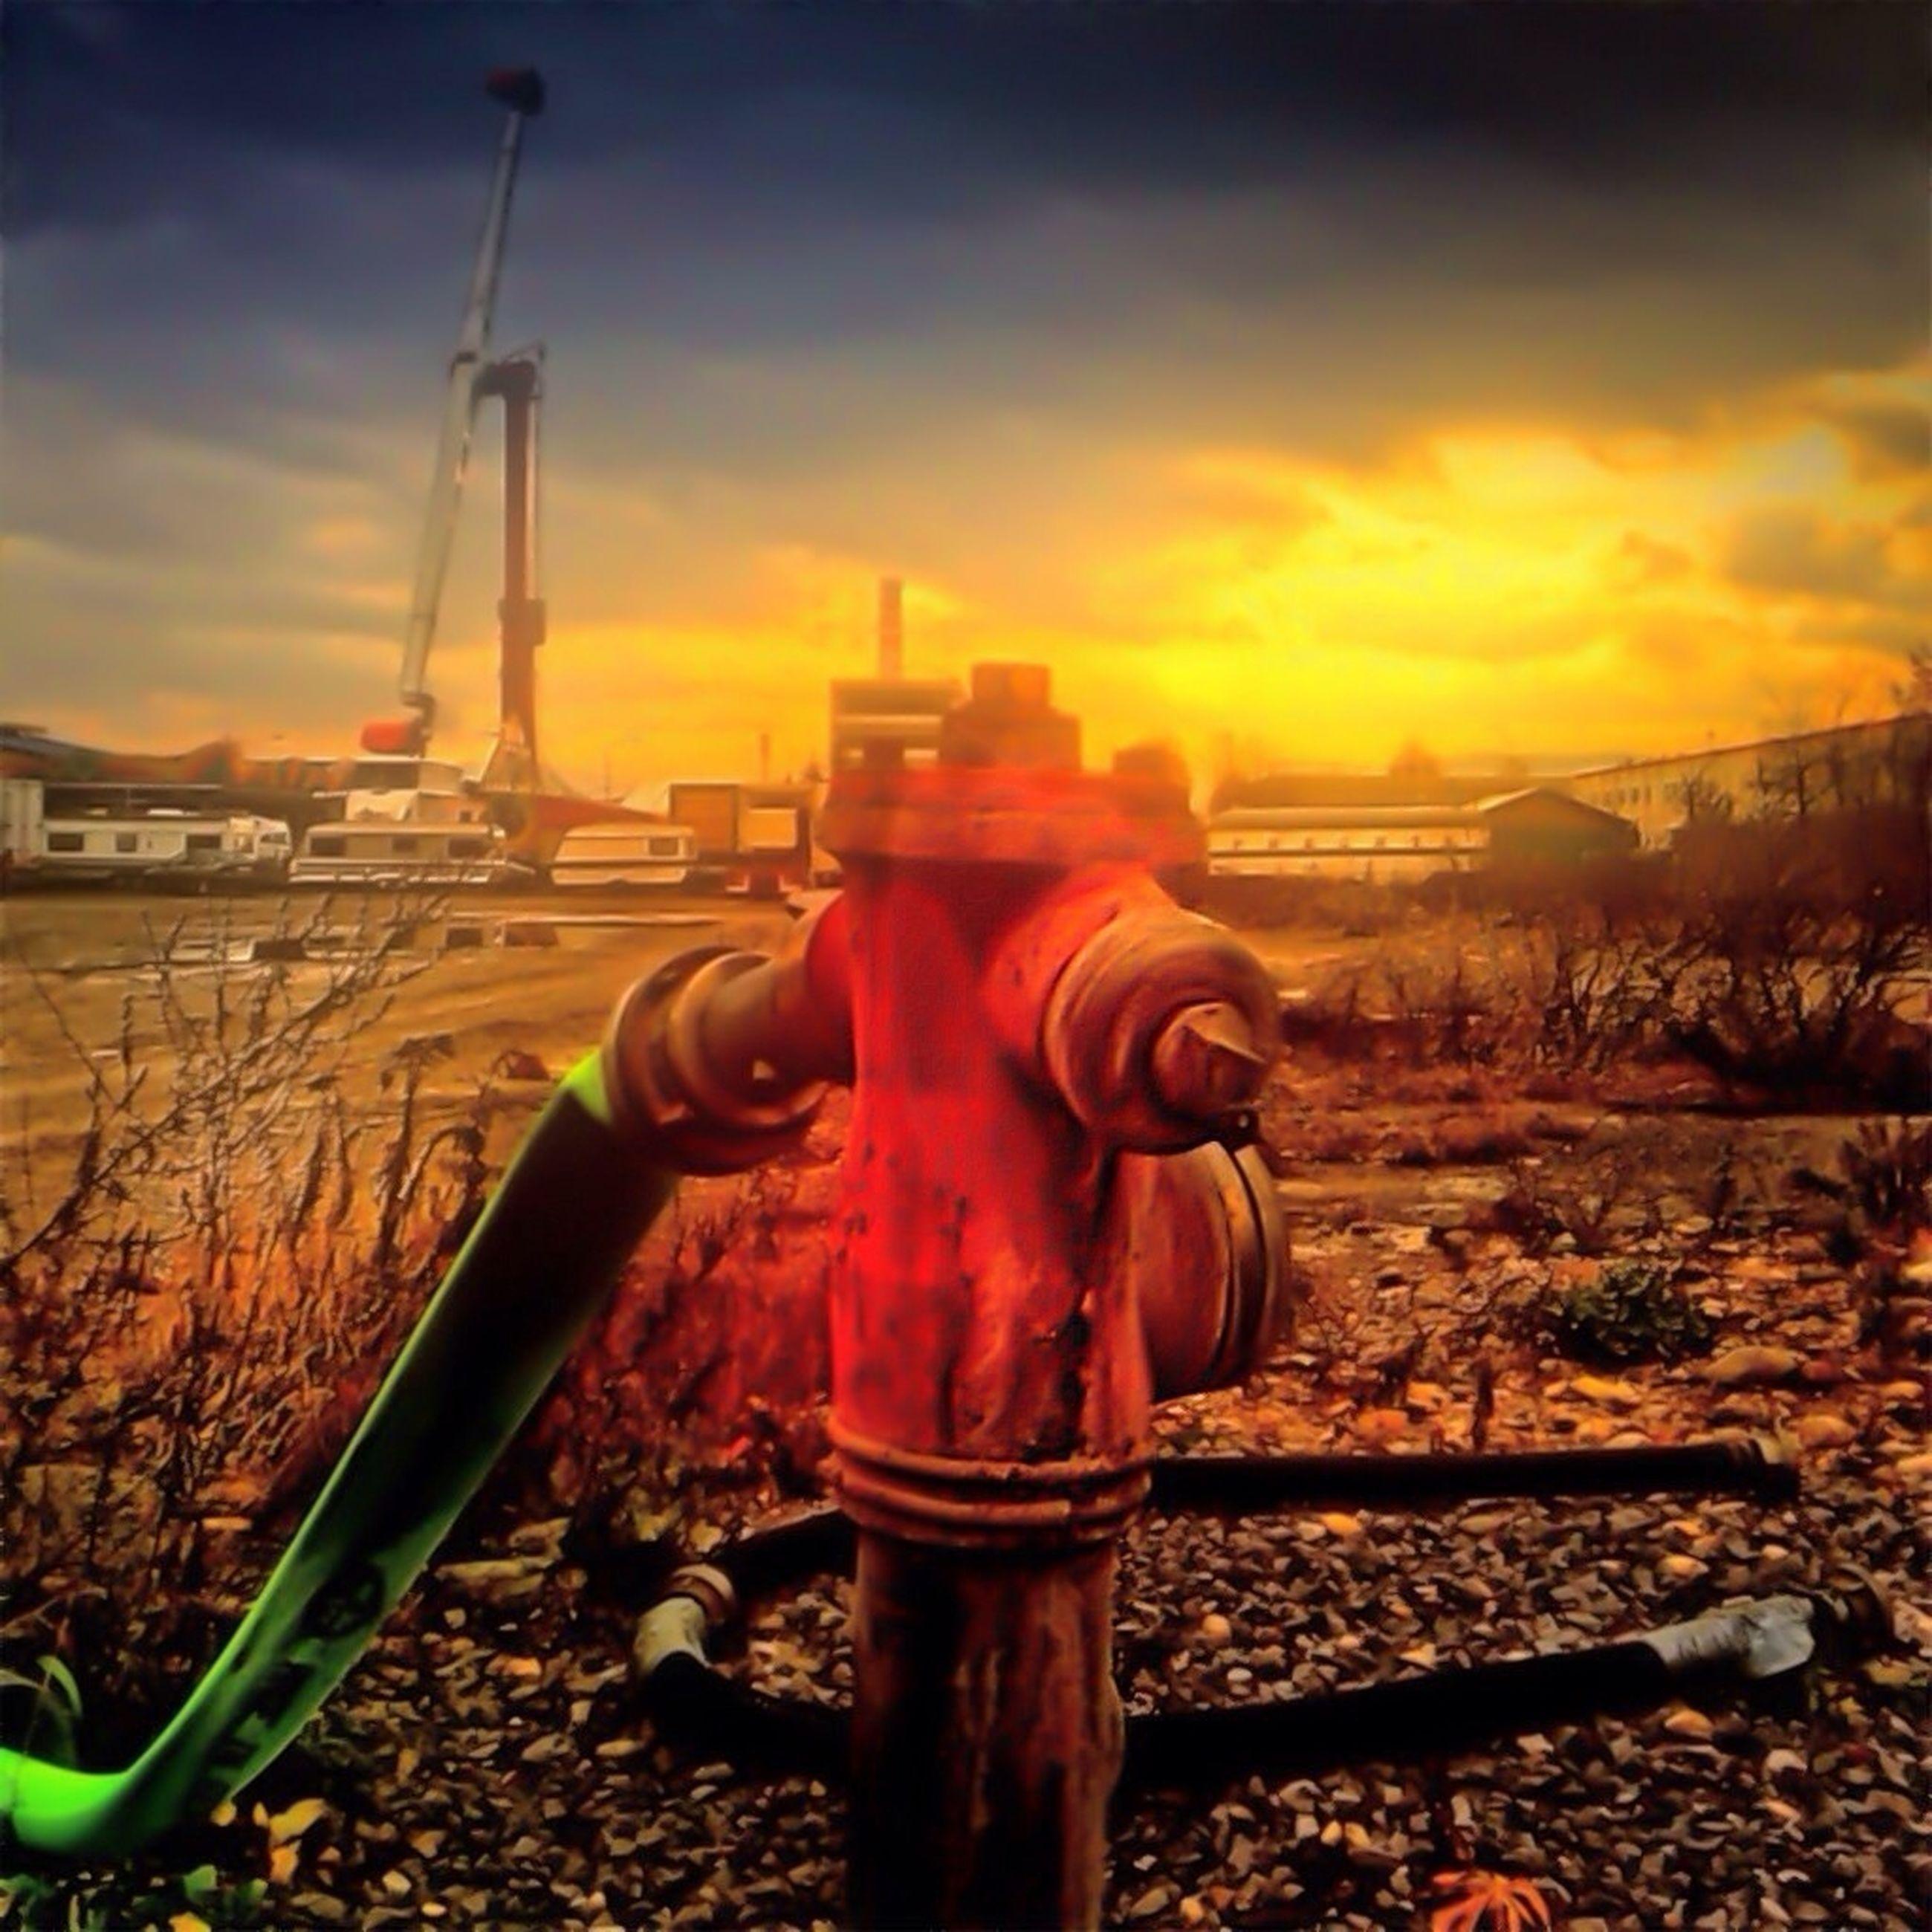 sunset, sky, orange color, railroad track, cloud - sky, industry, metal, built structure, outdoors, sunlight, nature, landscape, building exterior, field, cloud, no people, architecture, metallic, tranquility, factory